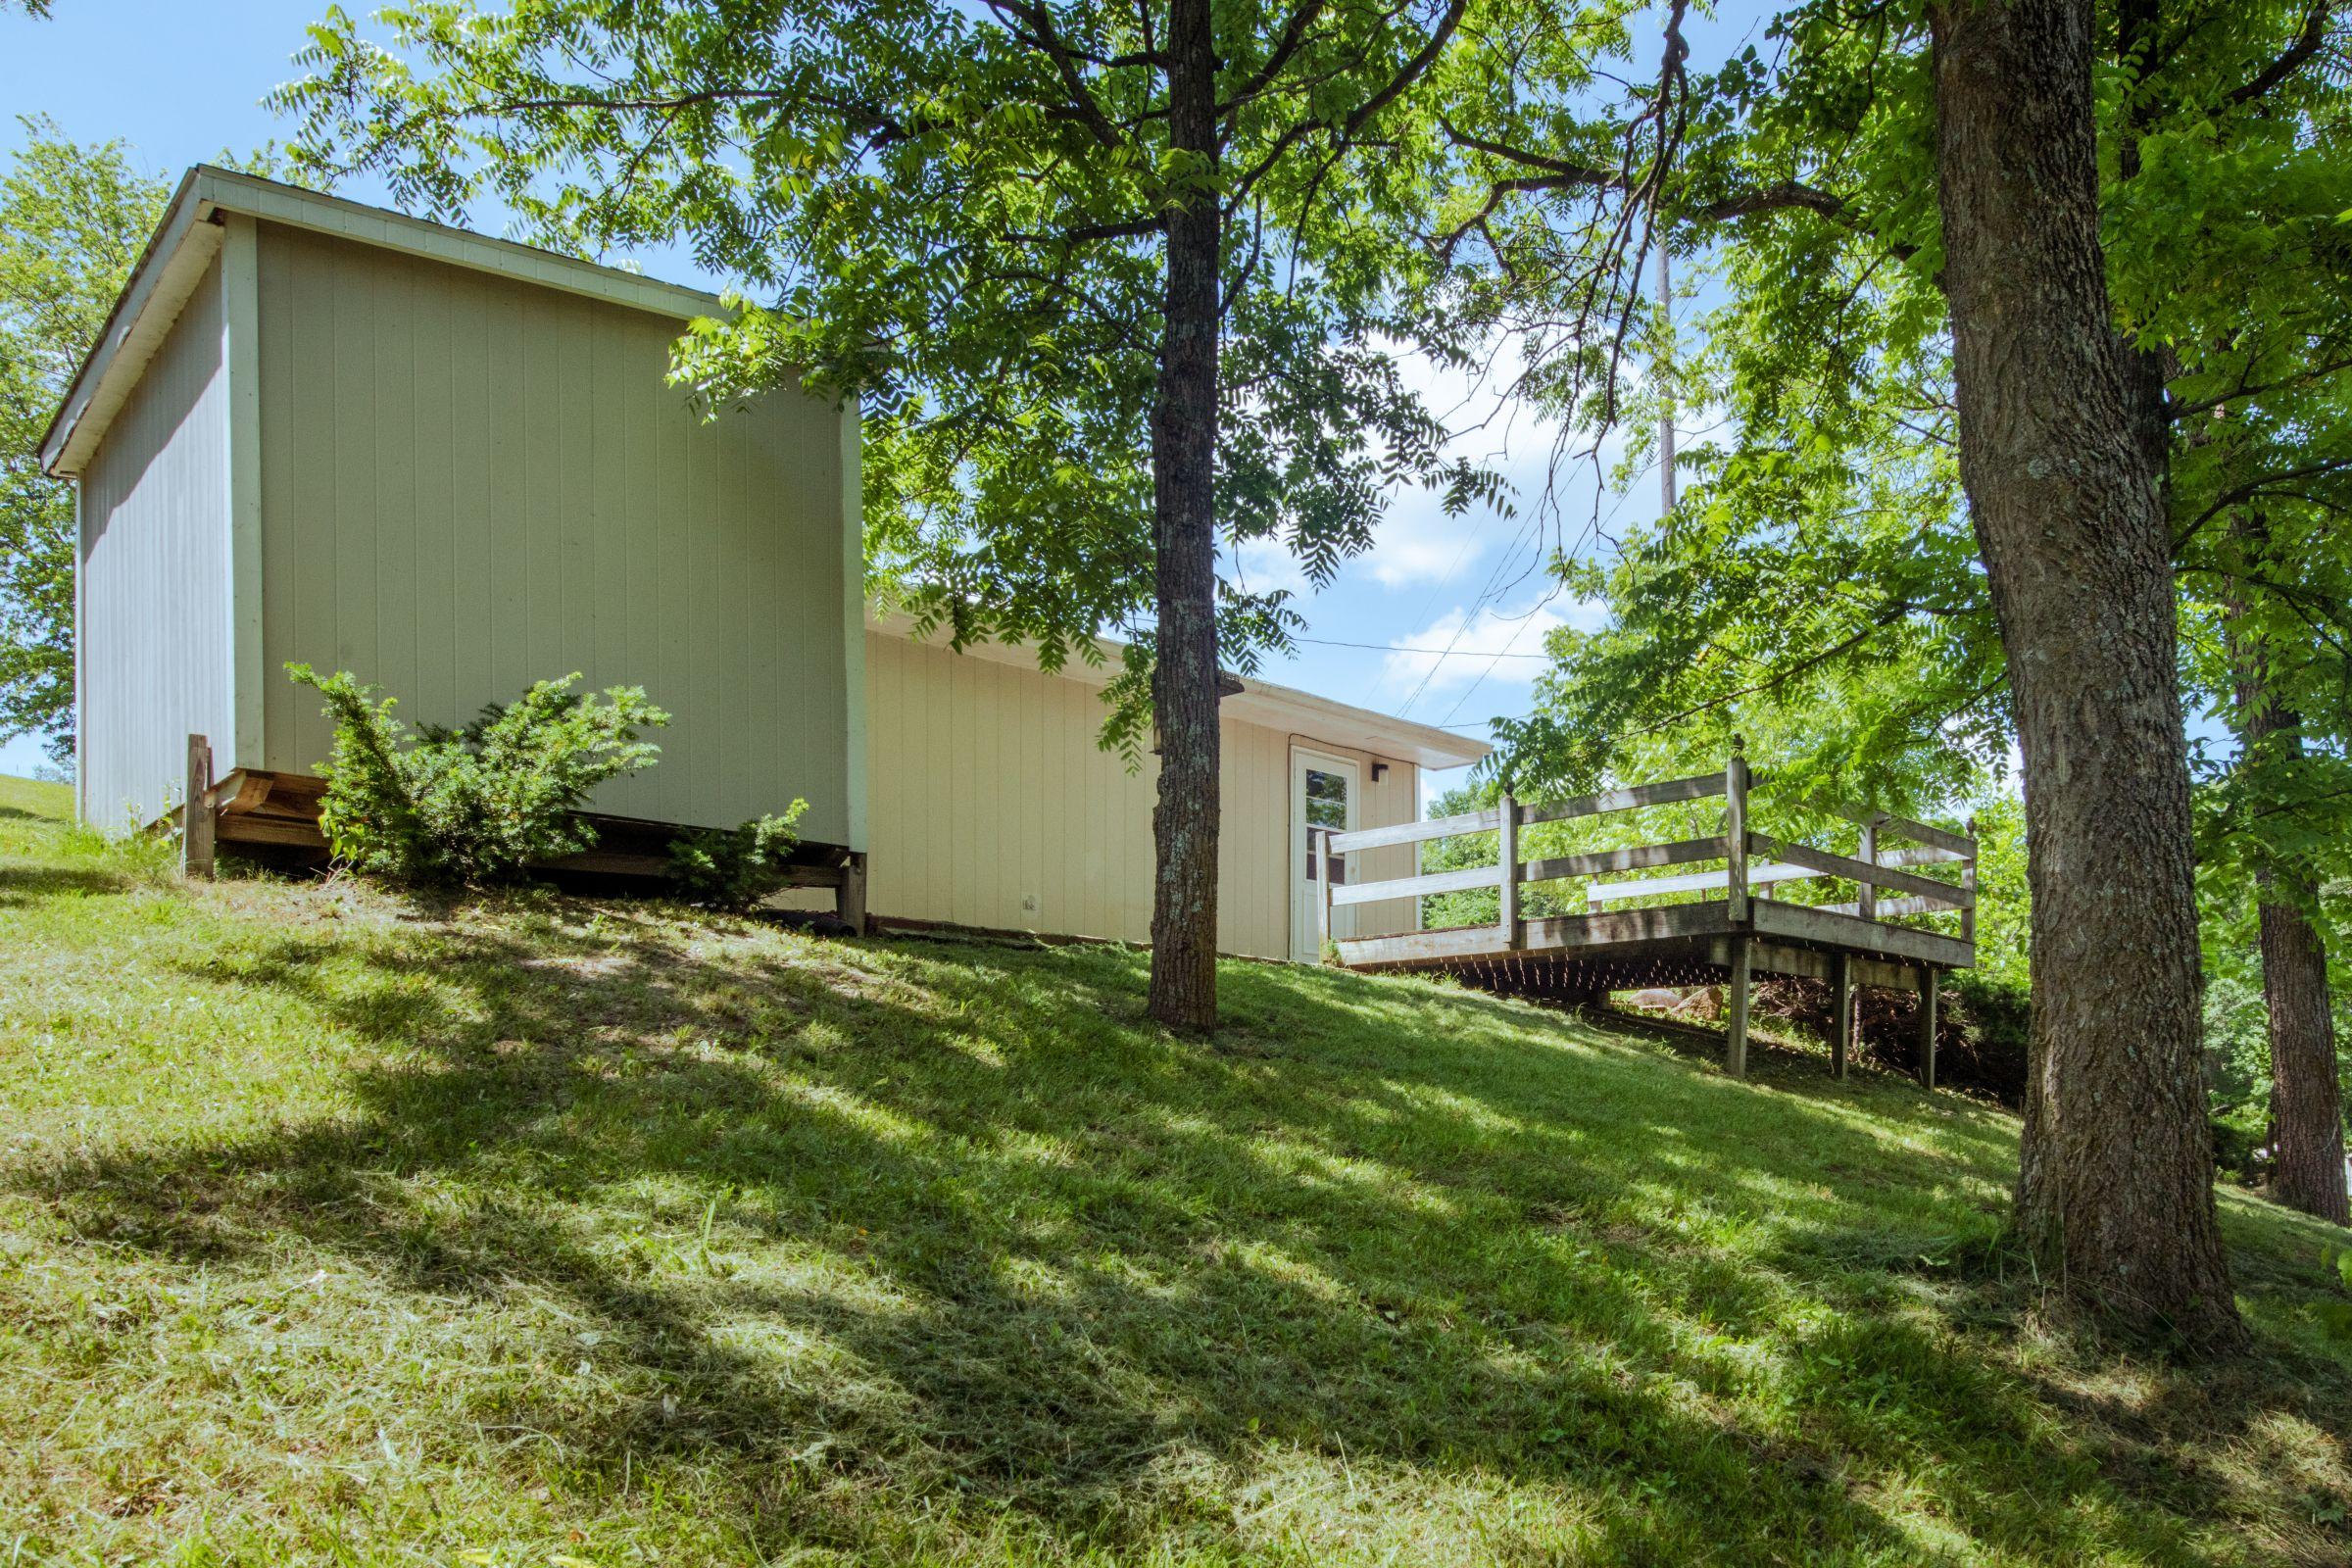 residential-warren-county-iowa-2-acres-listing-number-15576-3-2021-06-11-201320.jpg